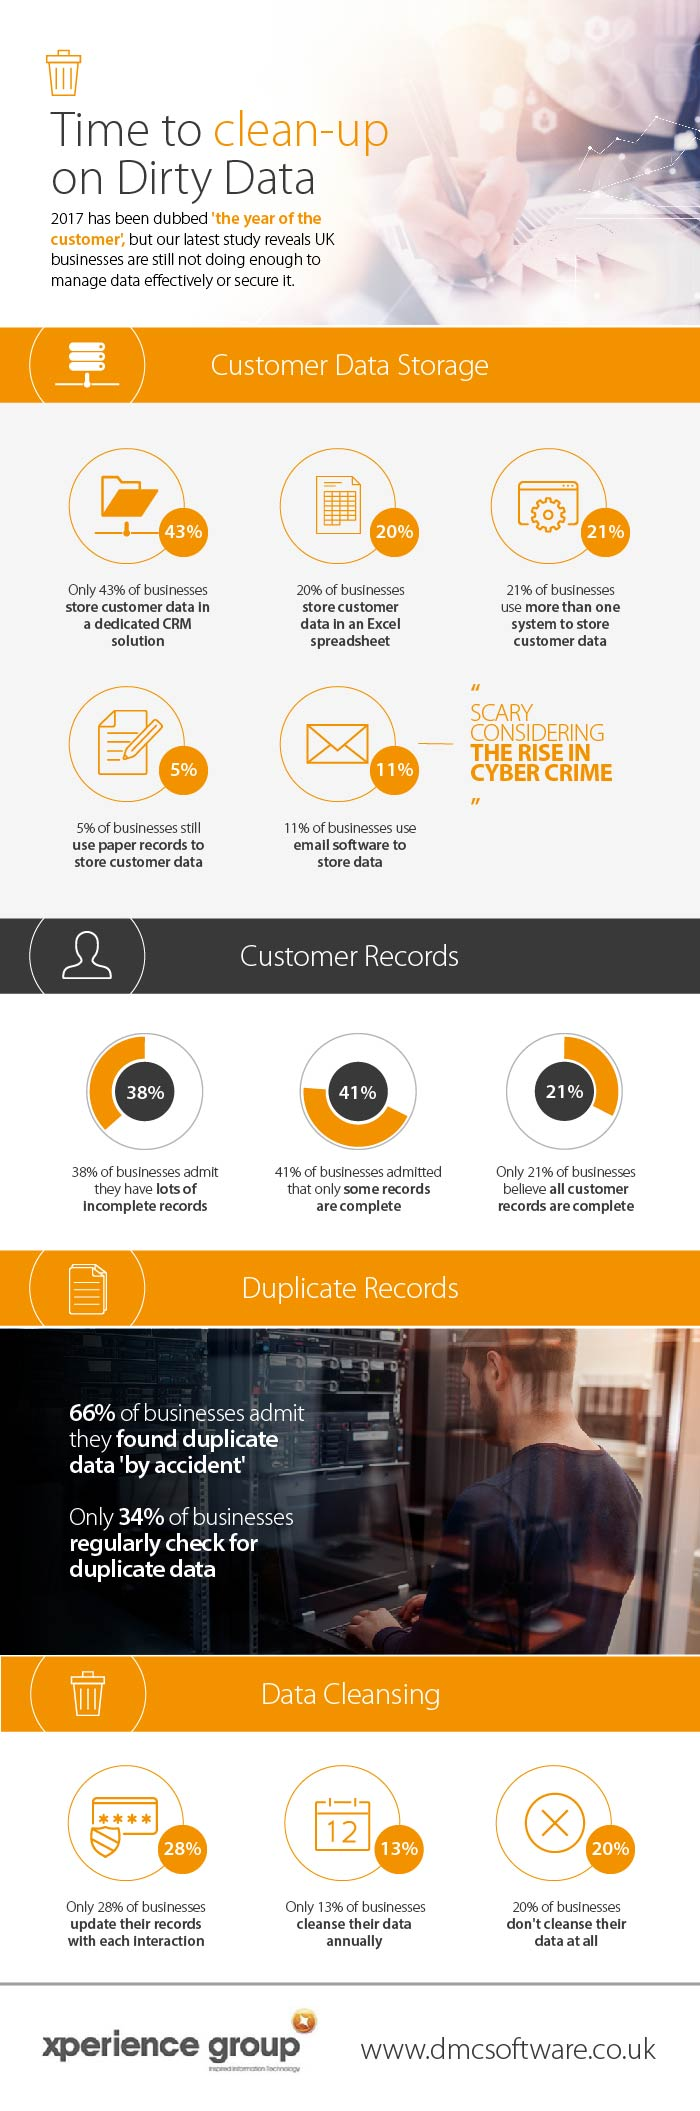 DMC Software Dirty Data Infographic